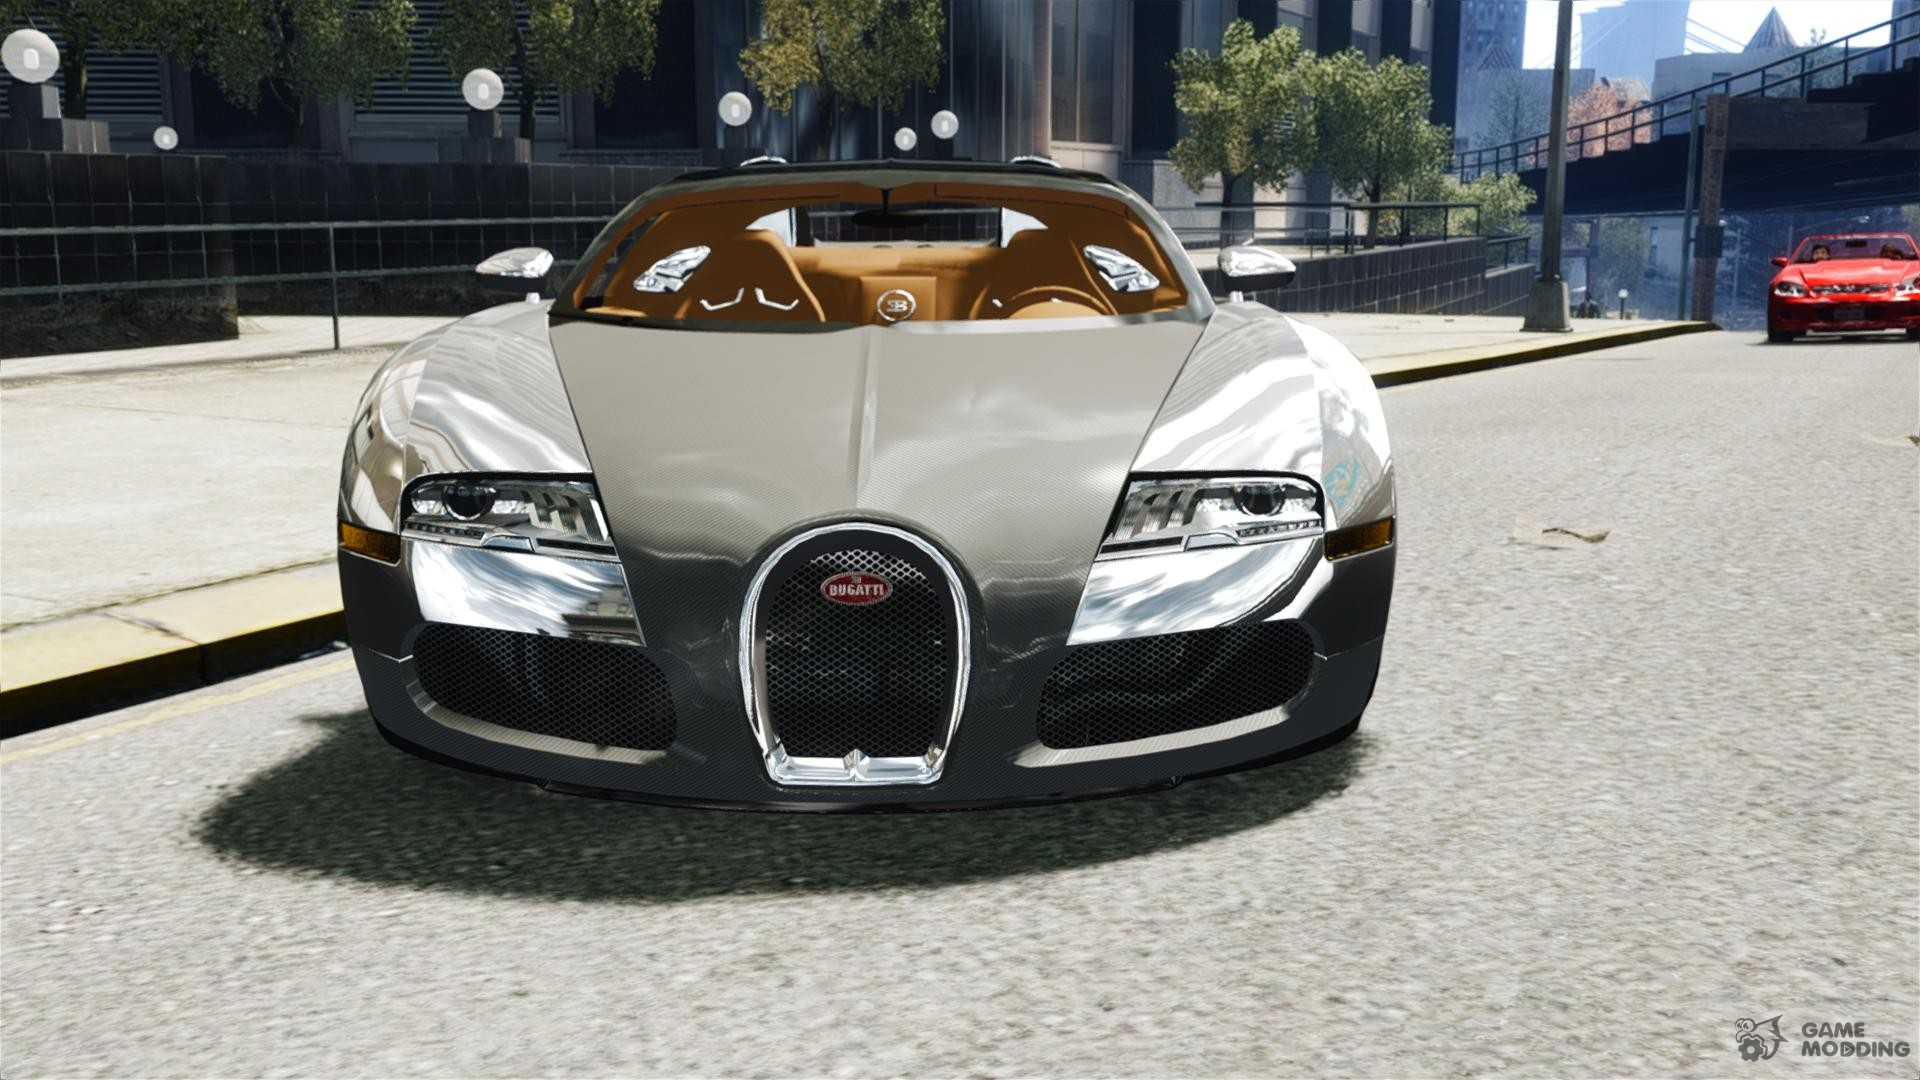 5eb1cef8fb6d88501c261163f6f933fb9d5430e362c7402990338005c5e46965 Gorgeous Bugatti Veyron Grand Sport Vitesse Bleu Cars Trend